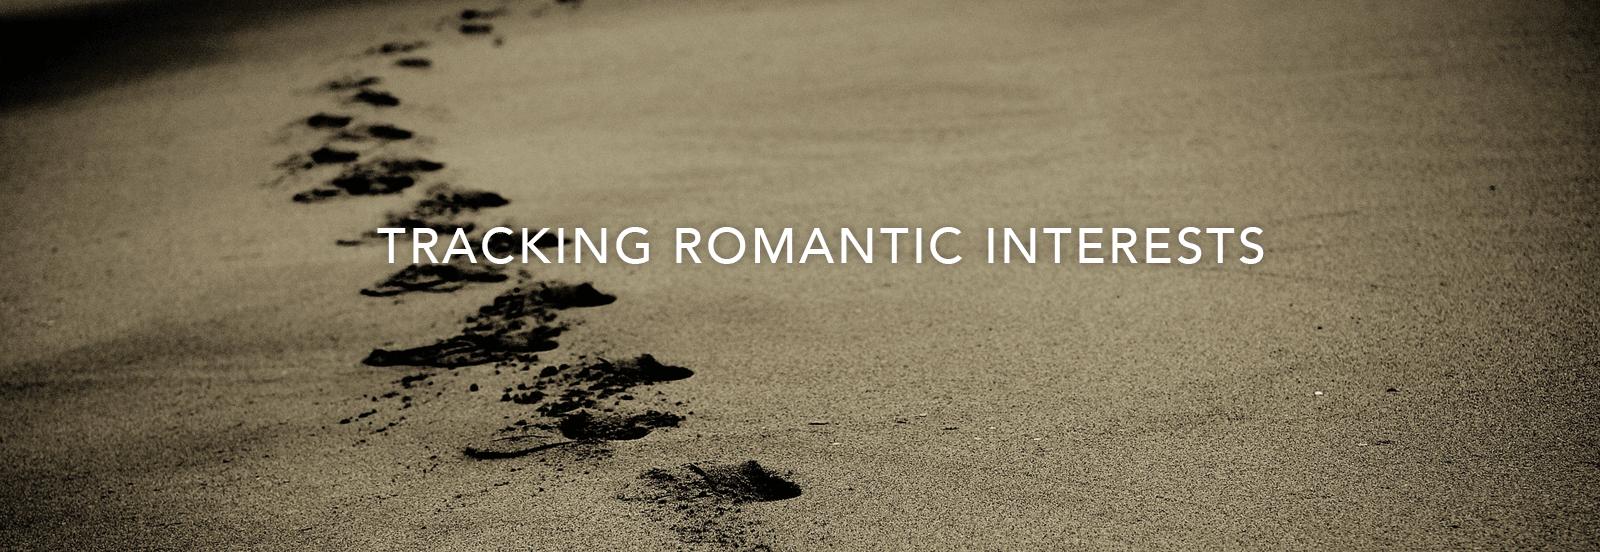 Tracking romantic interests